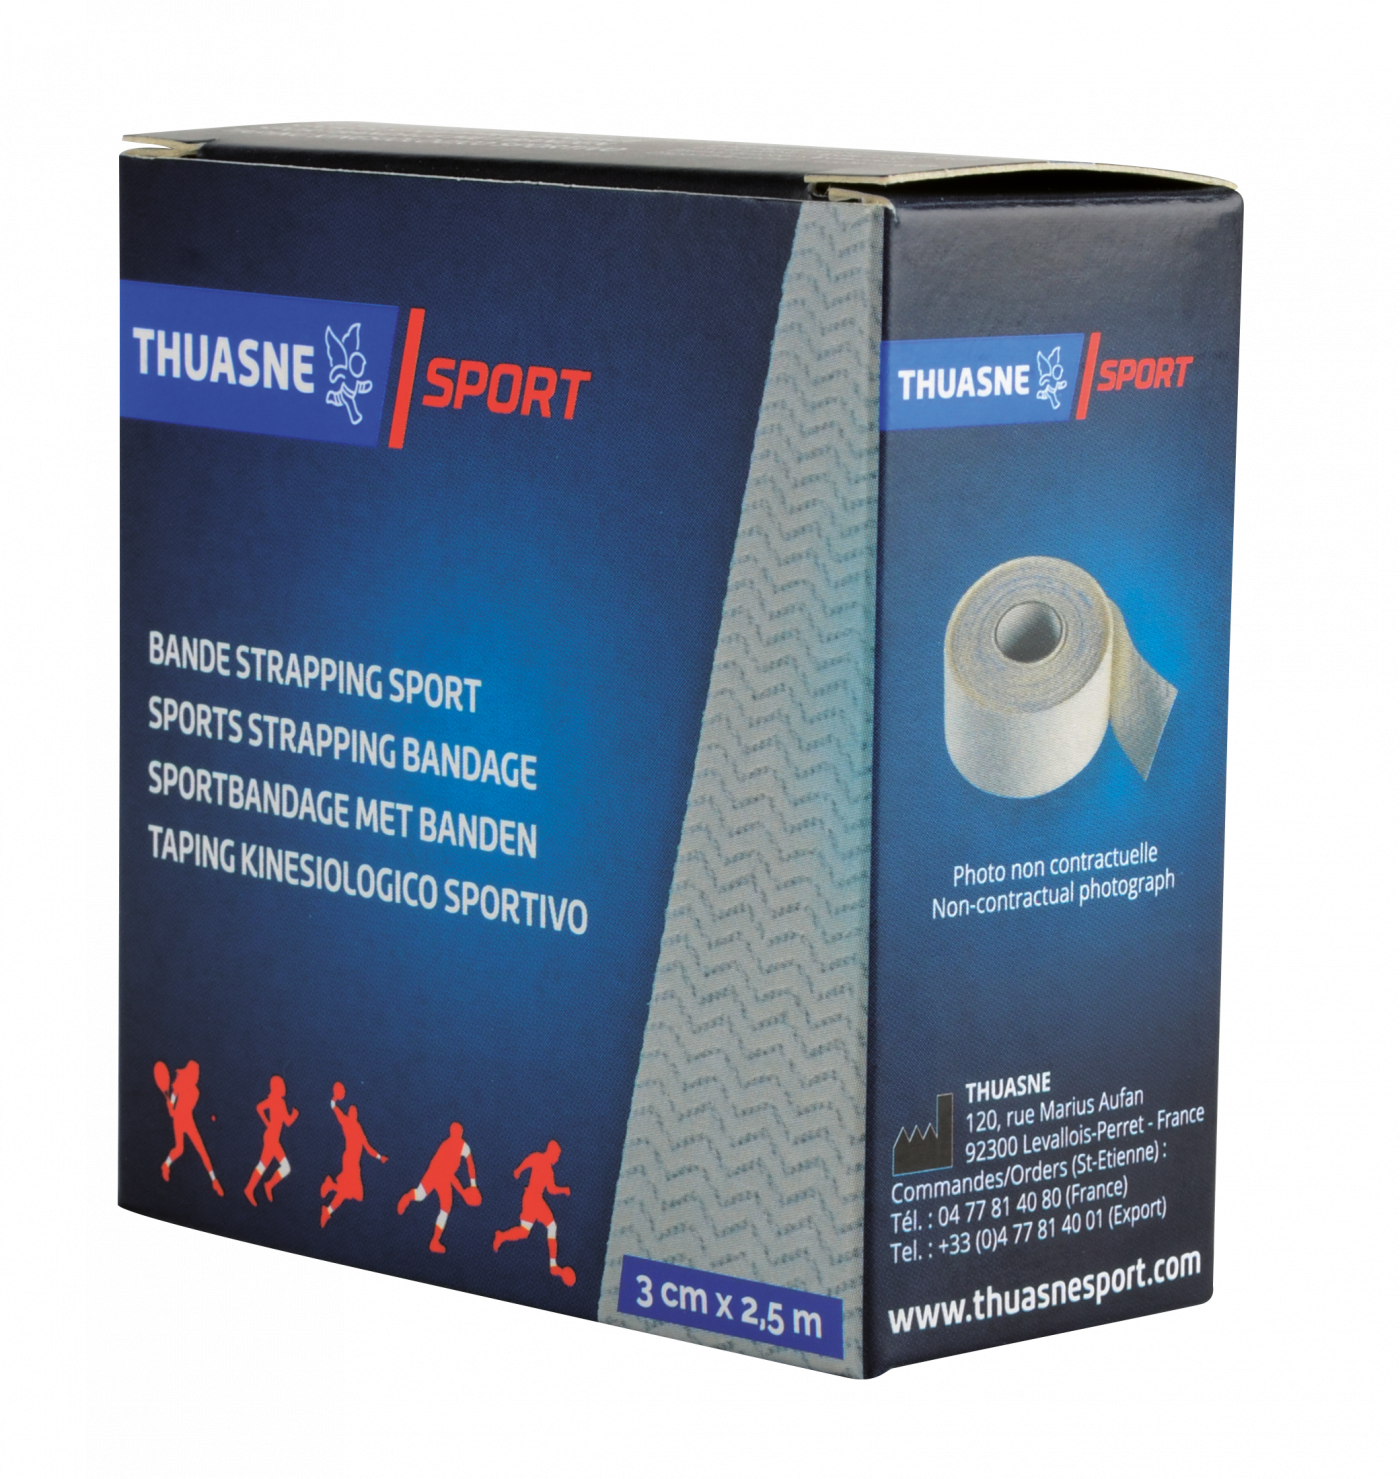 strap_thuasne_sport_running_runapck_2